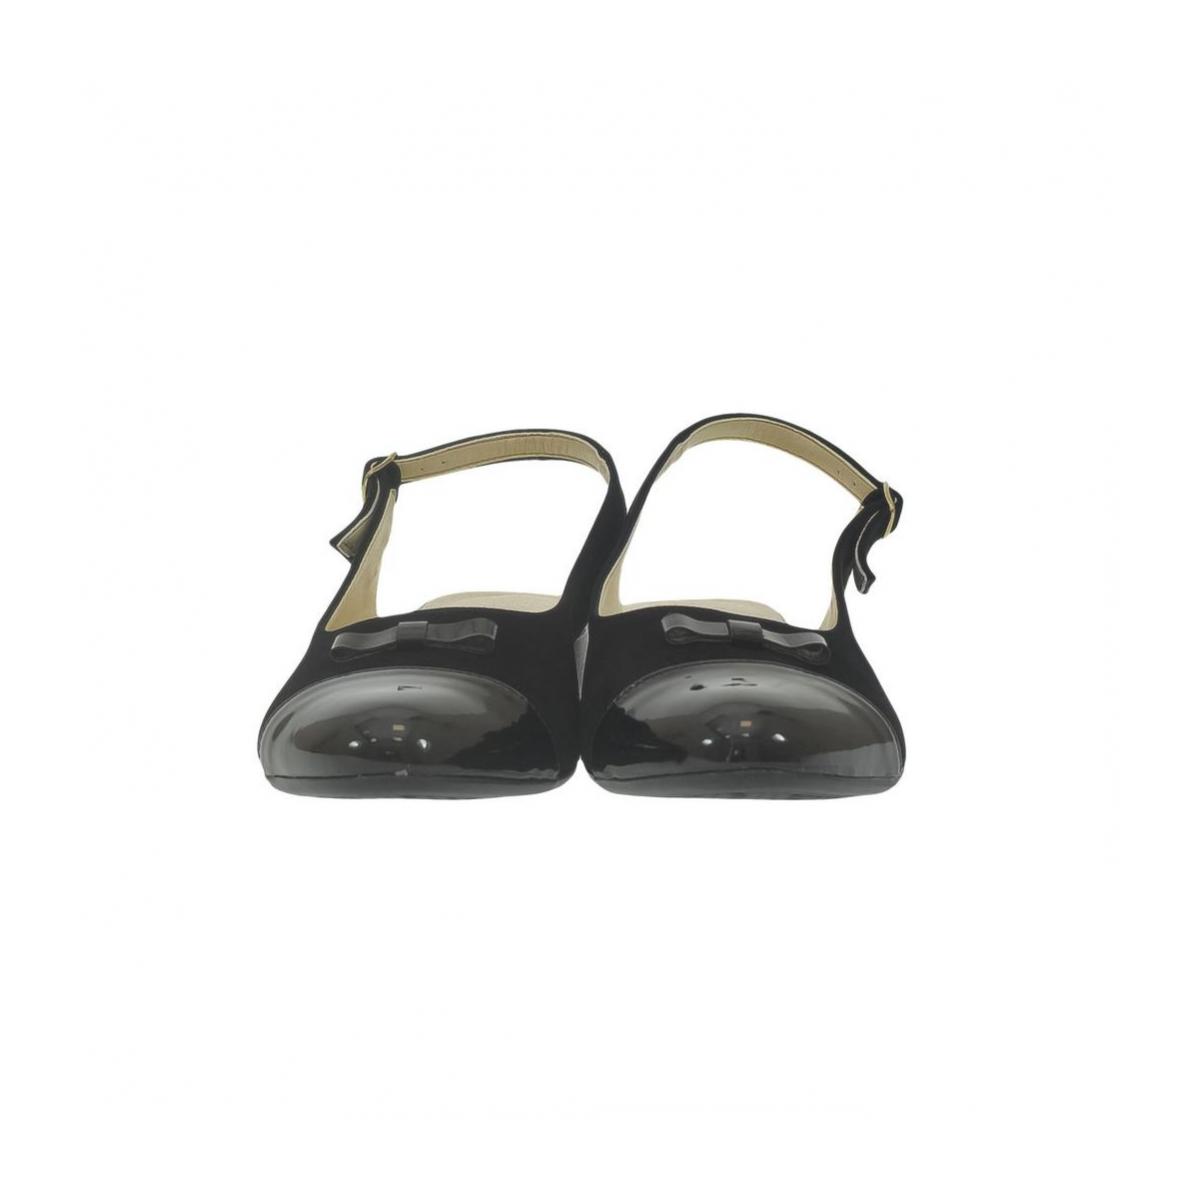 6a9a164e18a1 Dámske čierne sandále EVELINE - 2